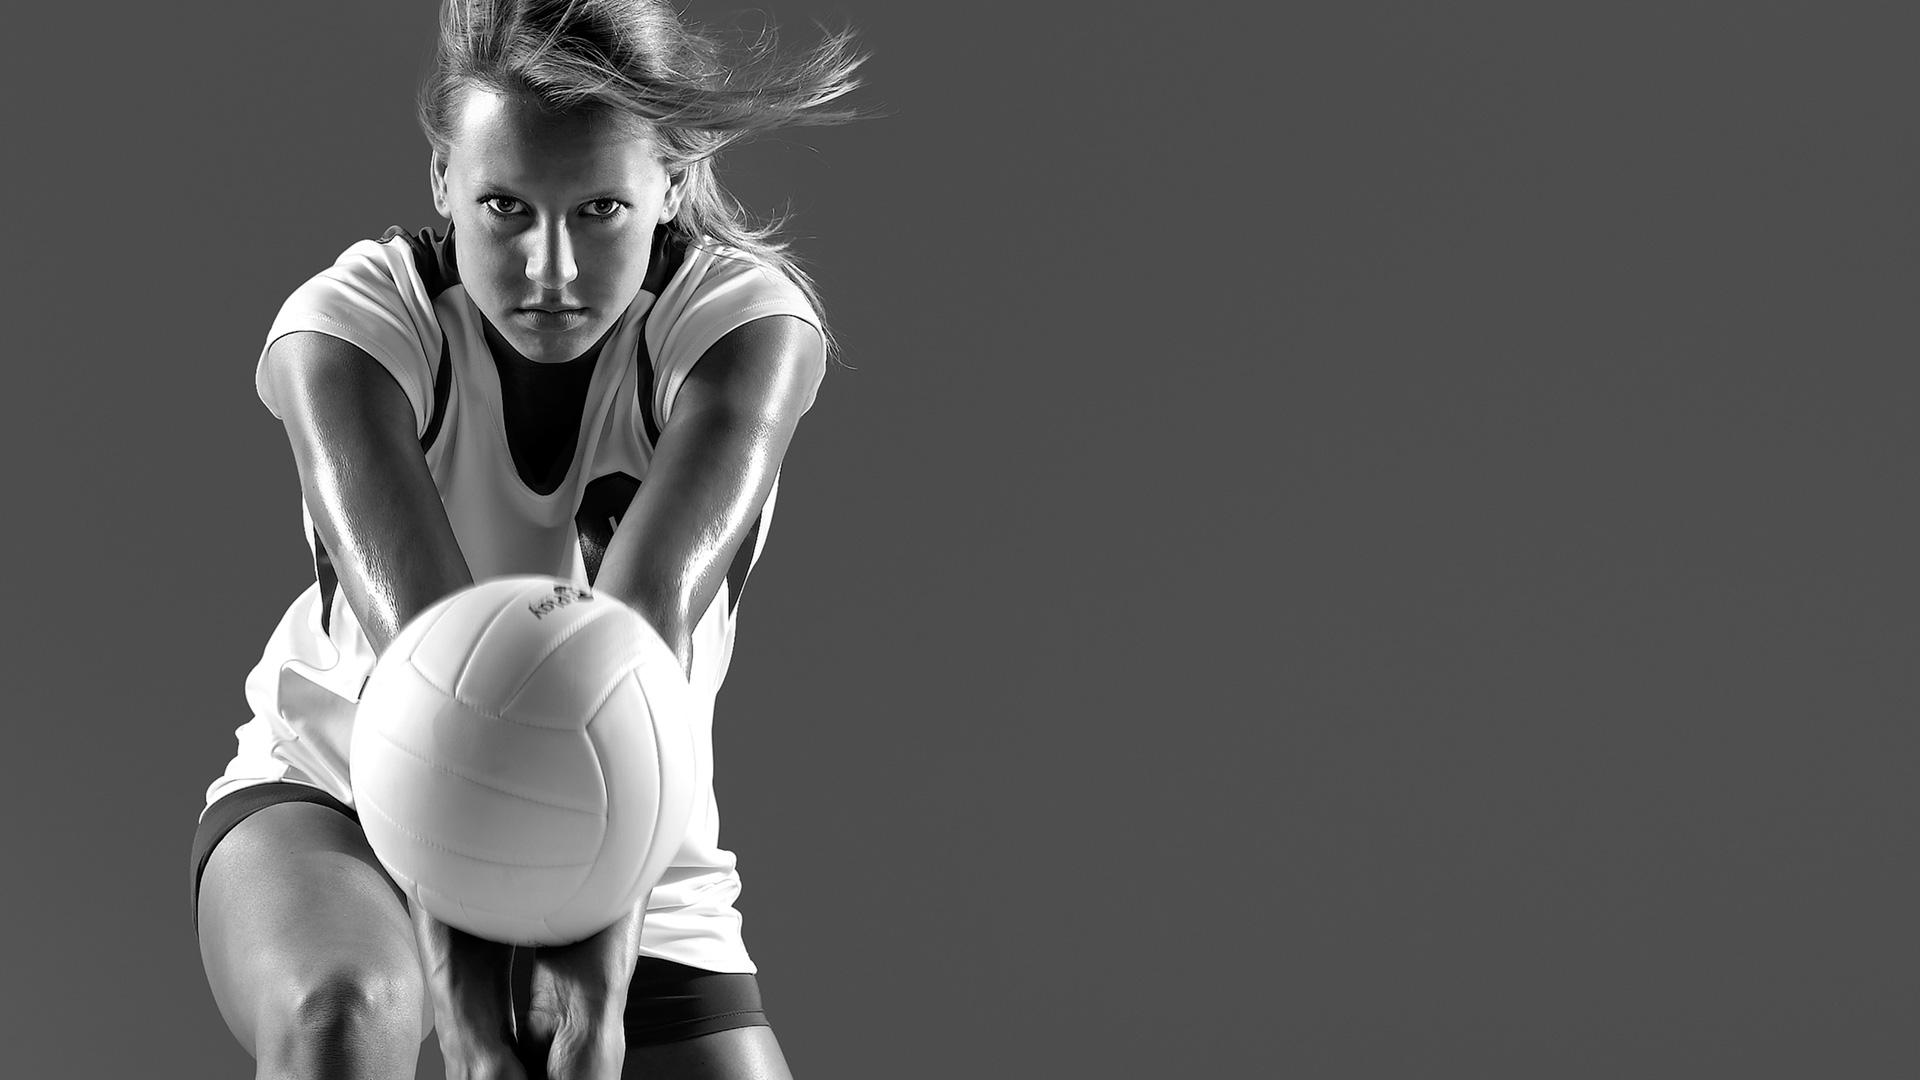 Black Wallpaper Hd Antonino Barbagallo Photographer Woman S Volleyball